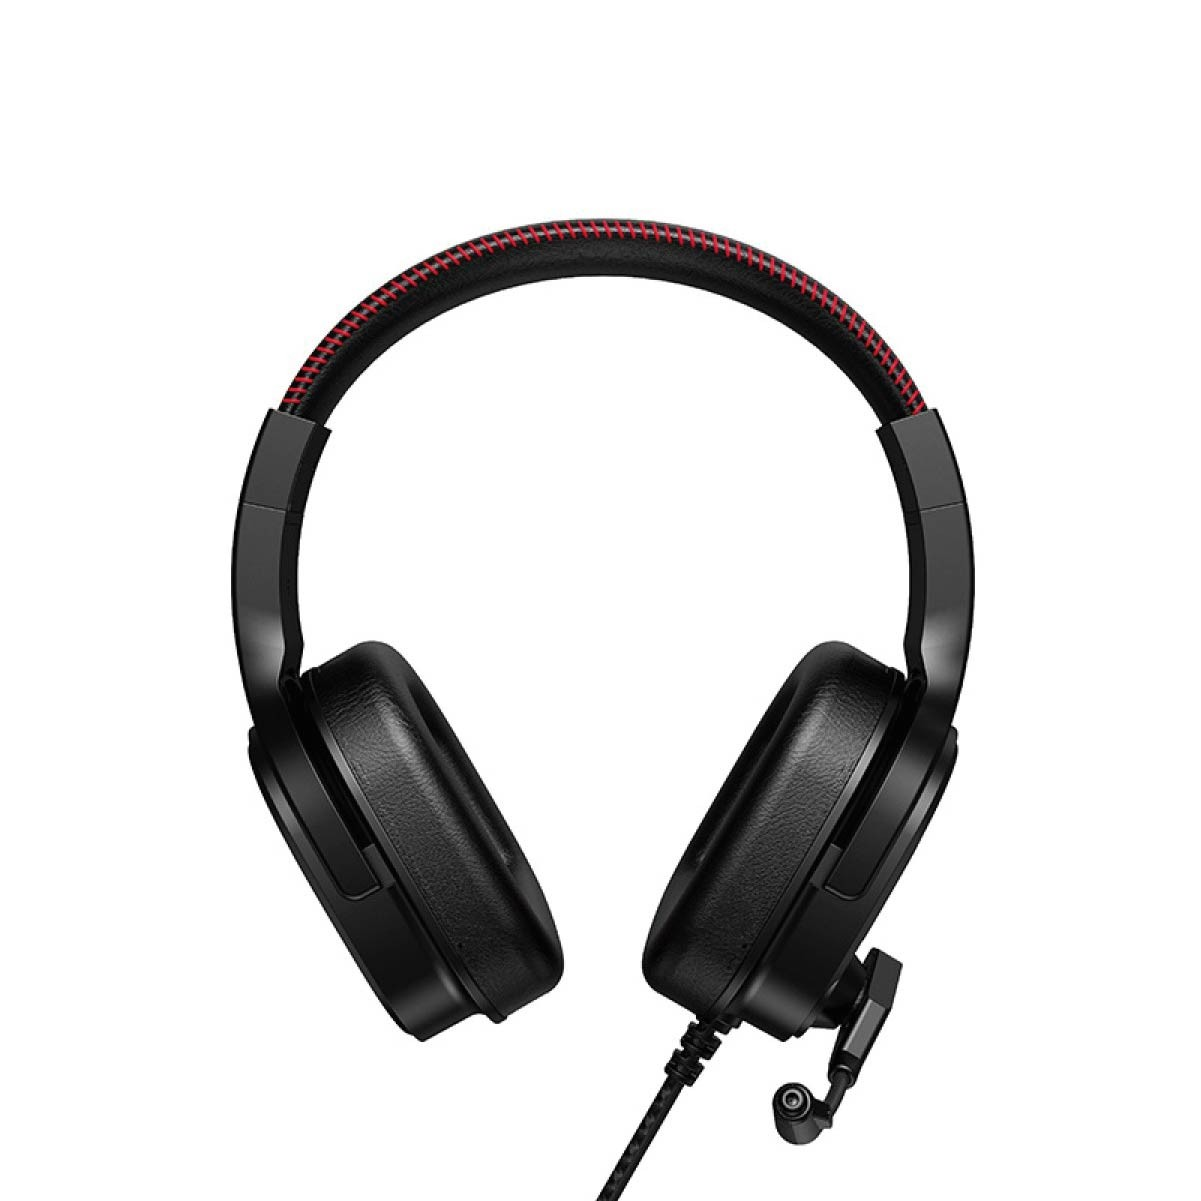 Fone de Ouvido Headset Gamer Havit H2022U LED RGB USB 7.1